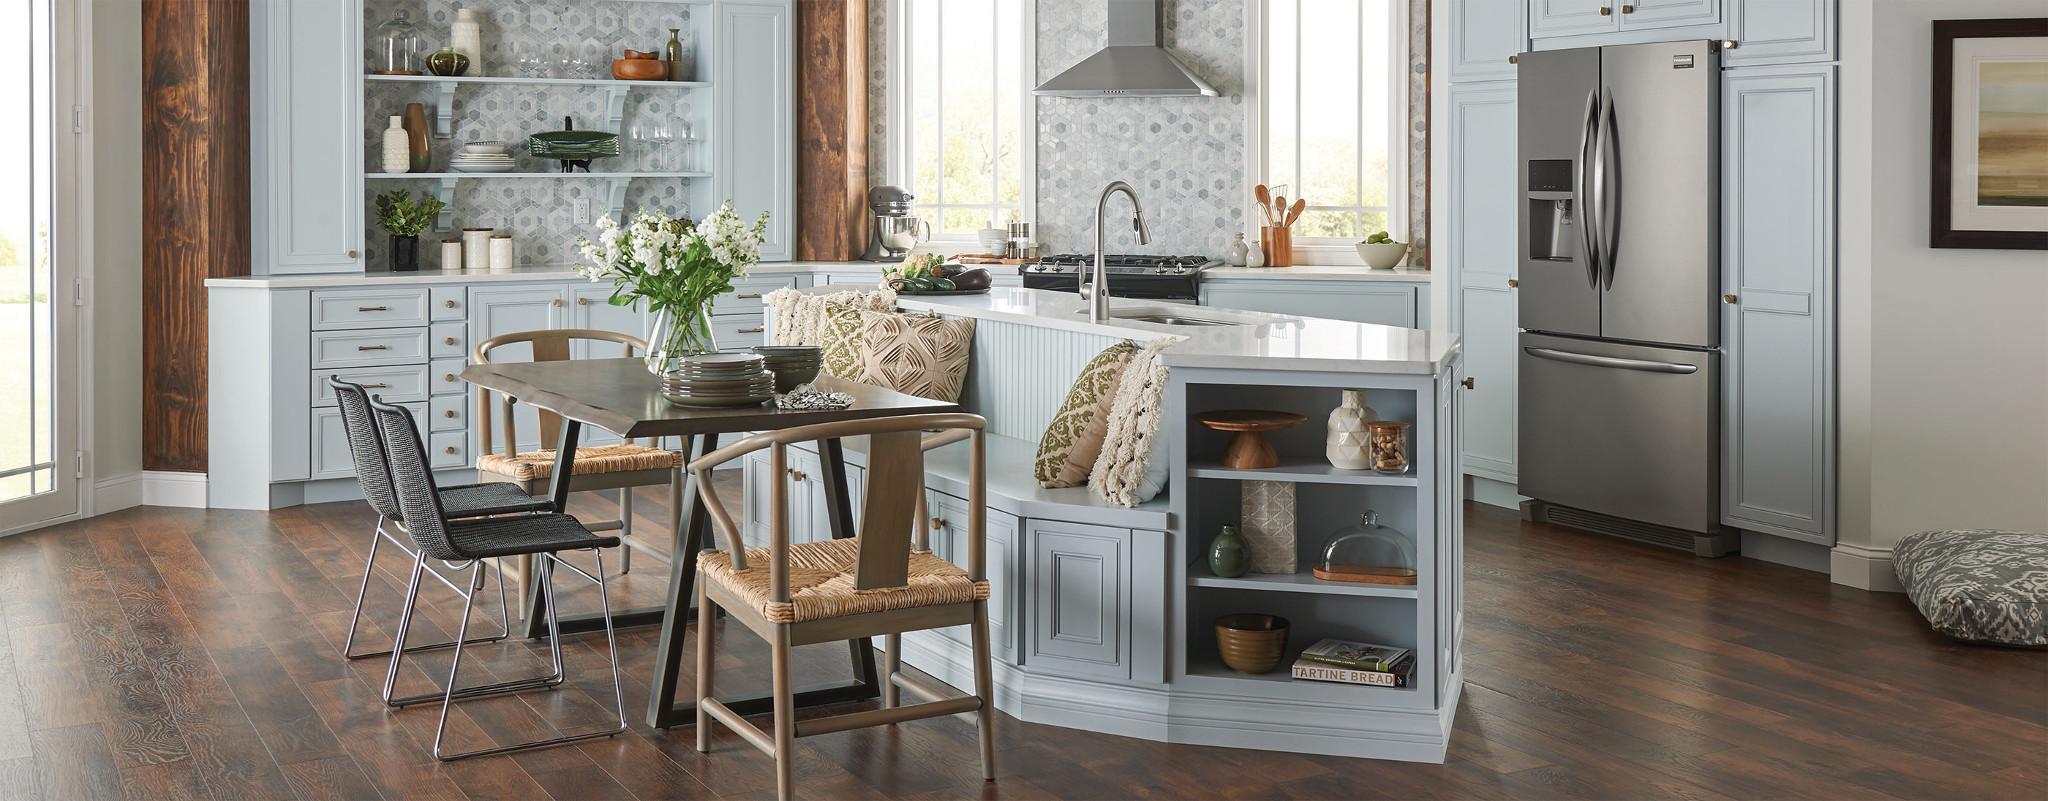 Arbor Spot Resist MotionSense Pulldown Kitchen Faucet 7594EWSRS